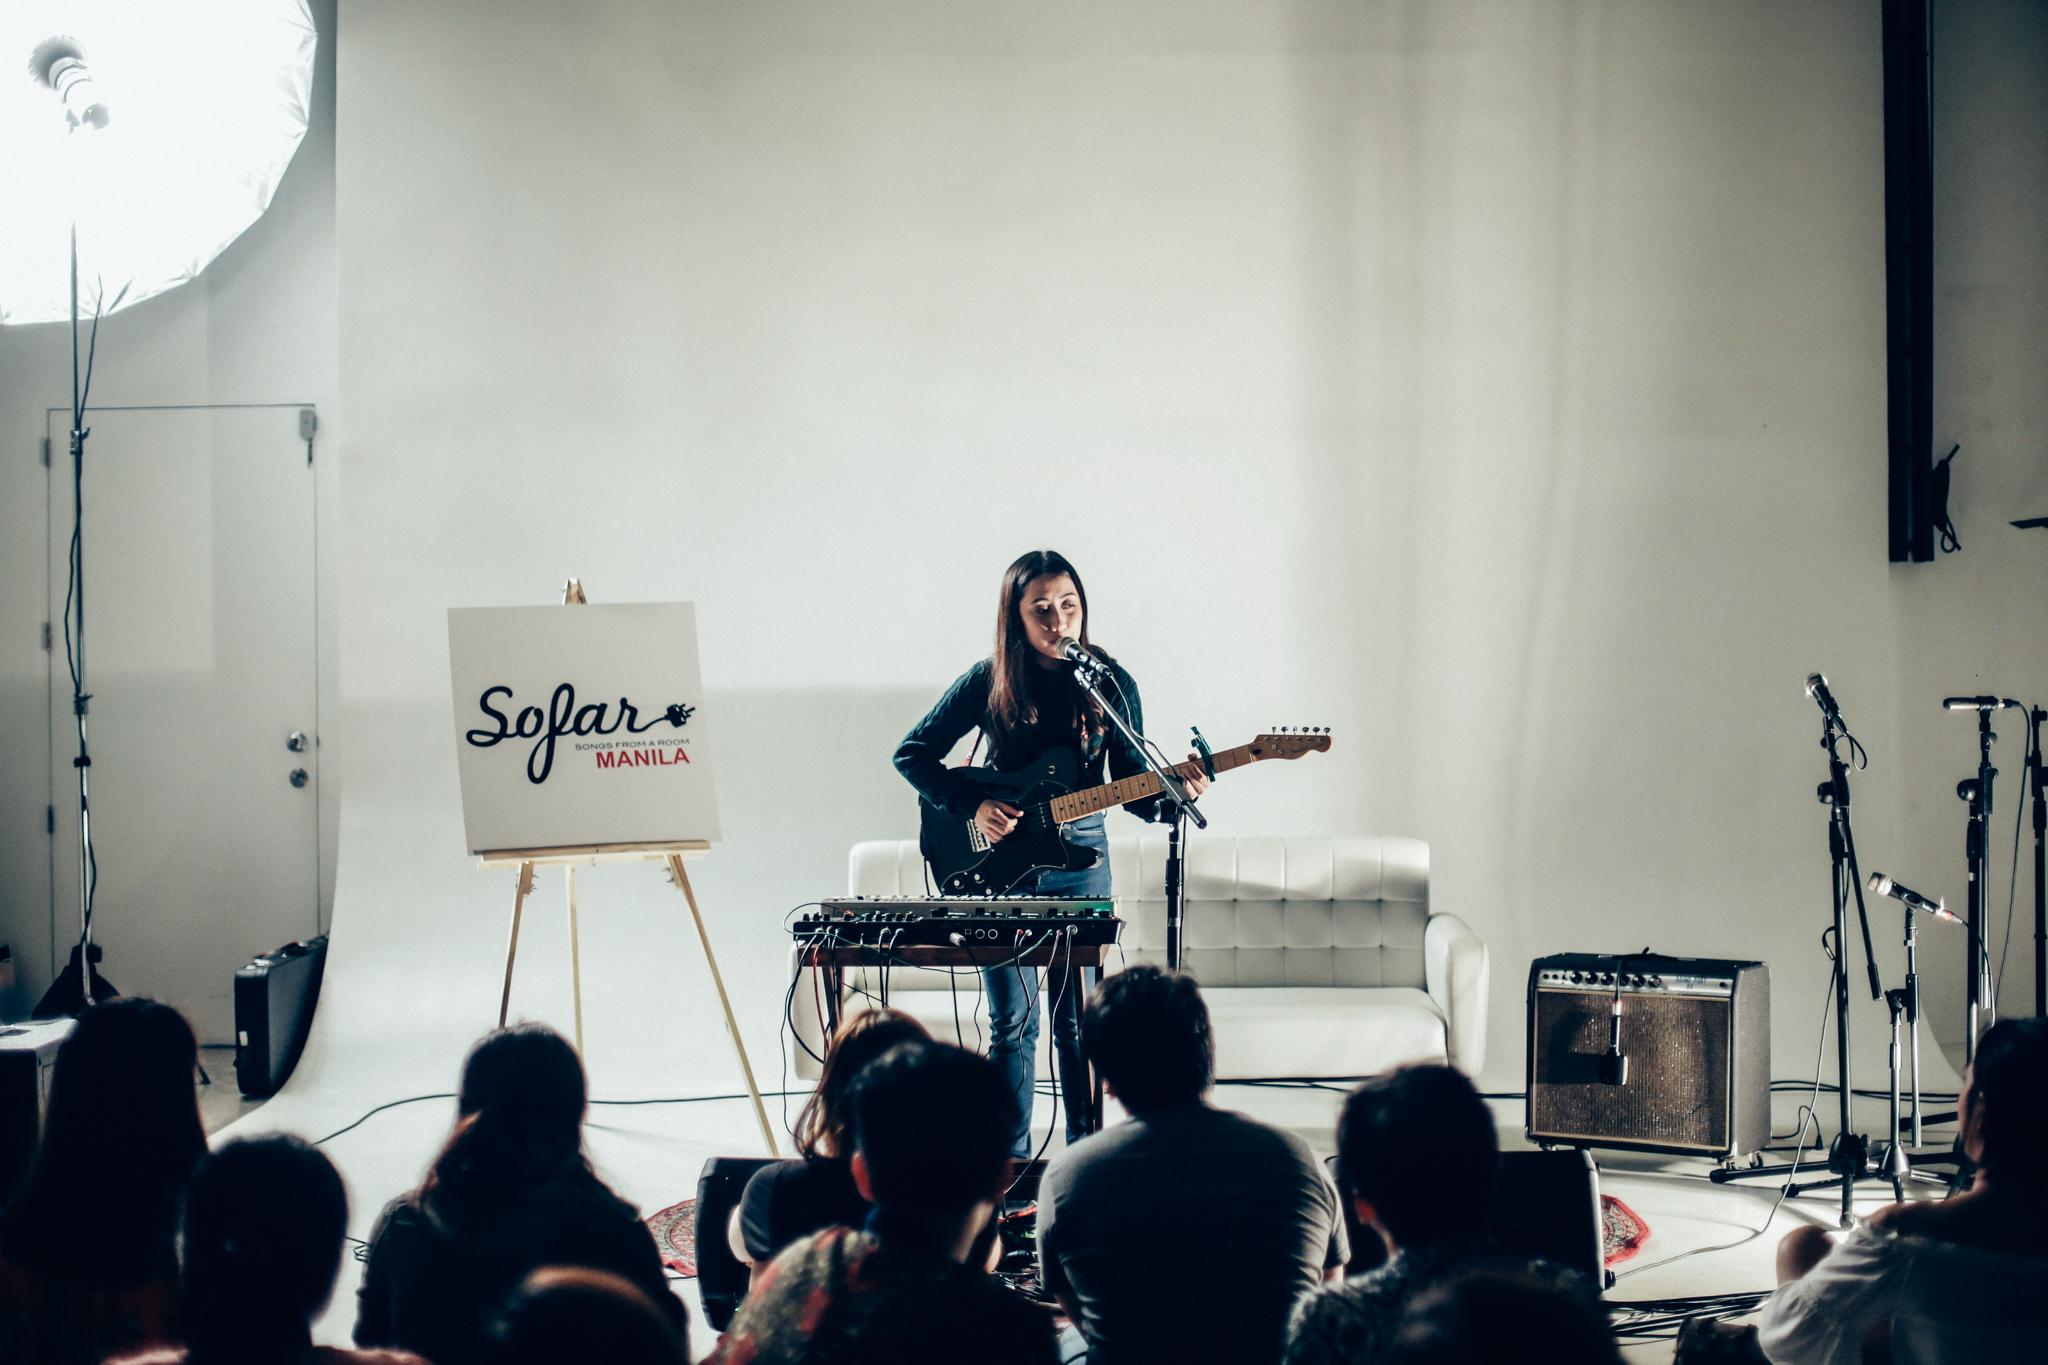 Sofar Sounds Manila: A Quiet Place for Music